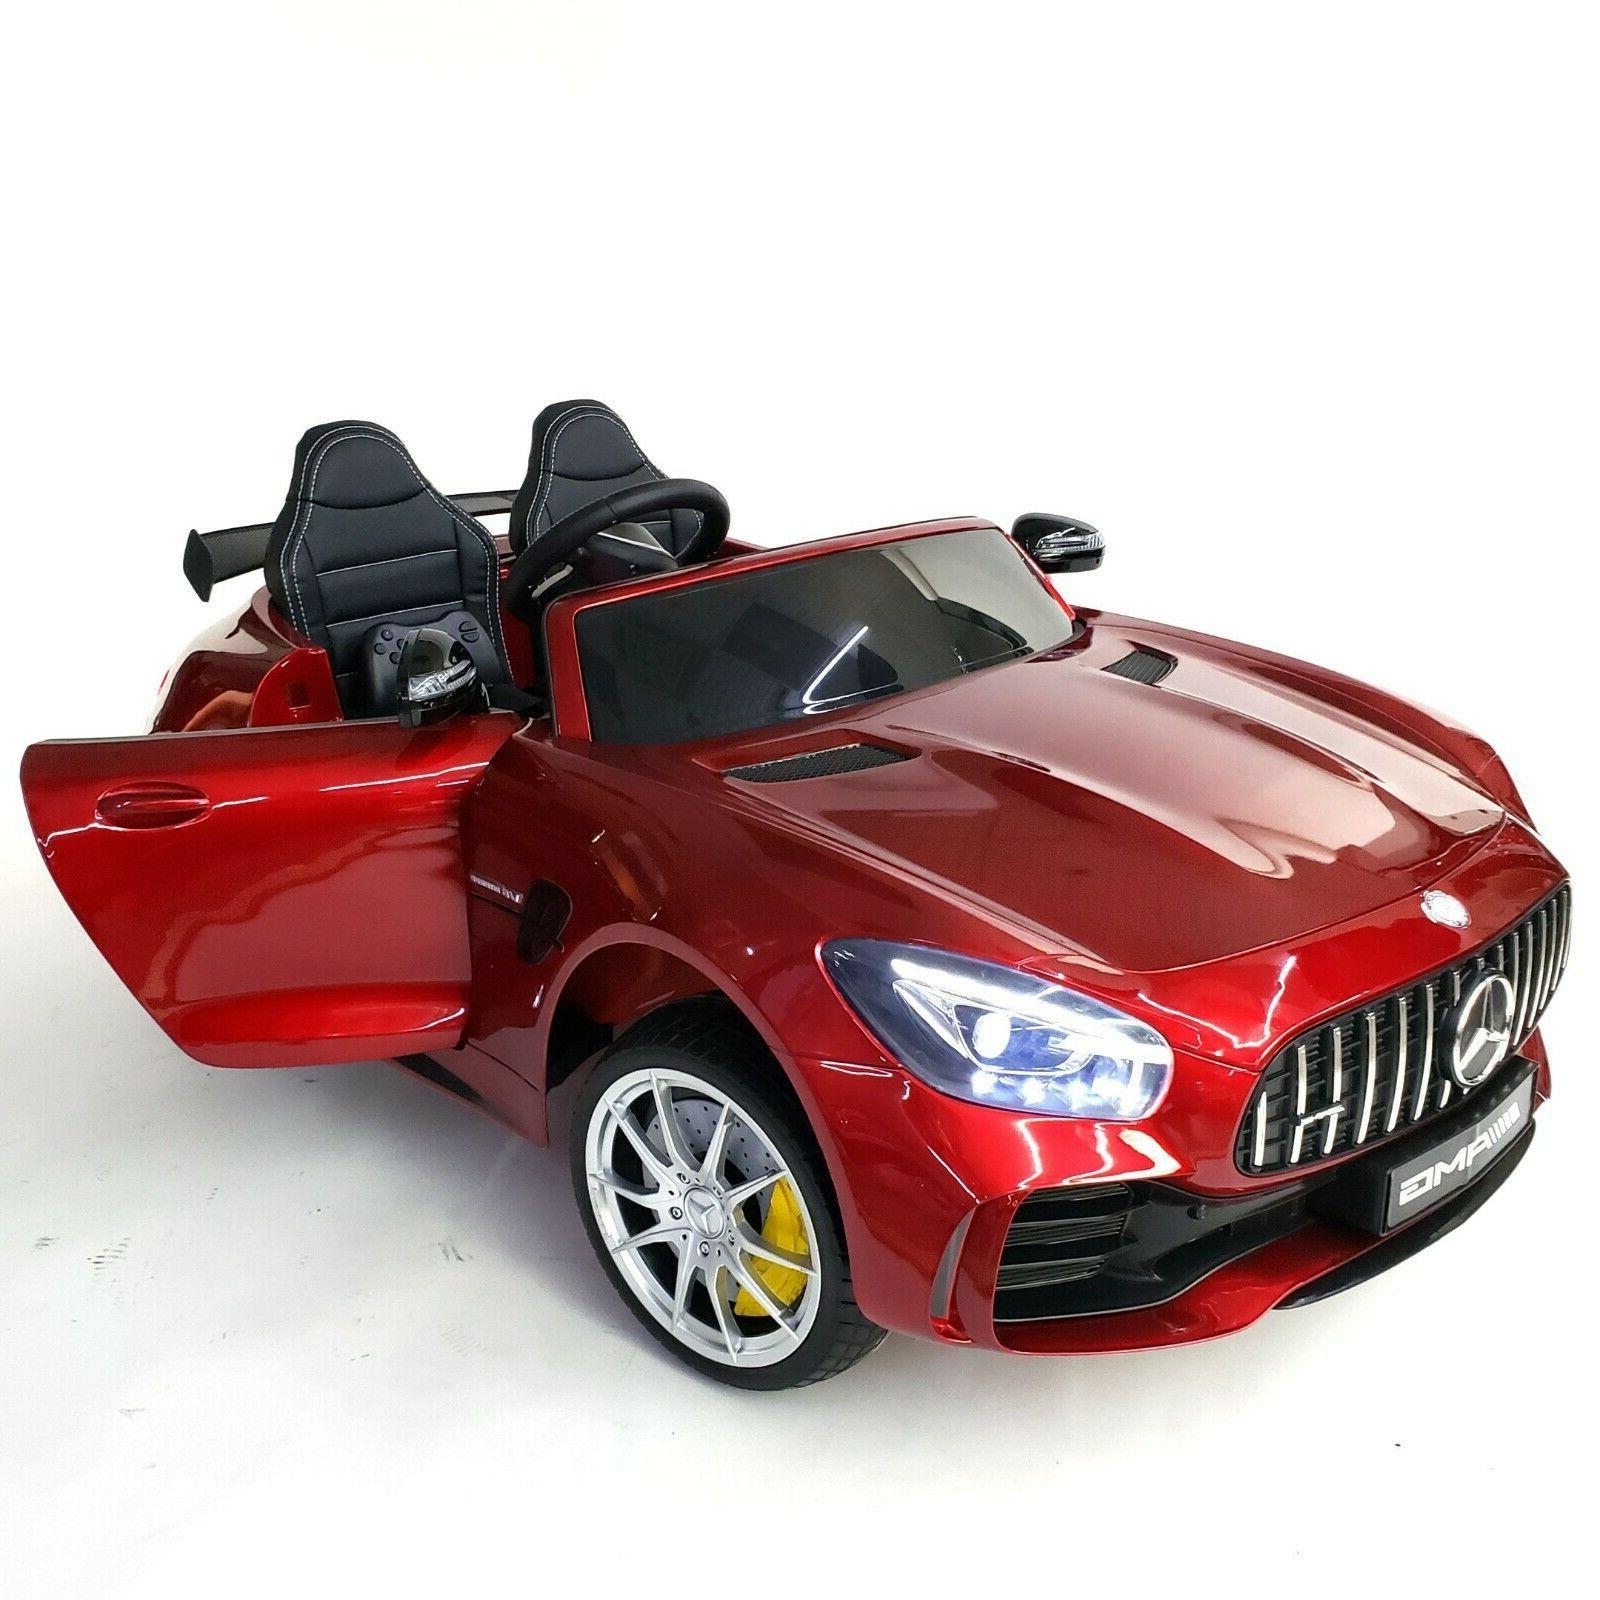 SUPER CAR PANAMERA KIDS ELECTRIC RIDE ON BRUSHLESS